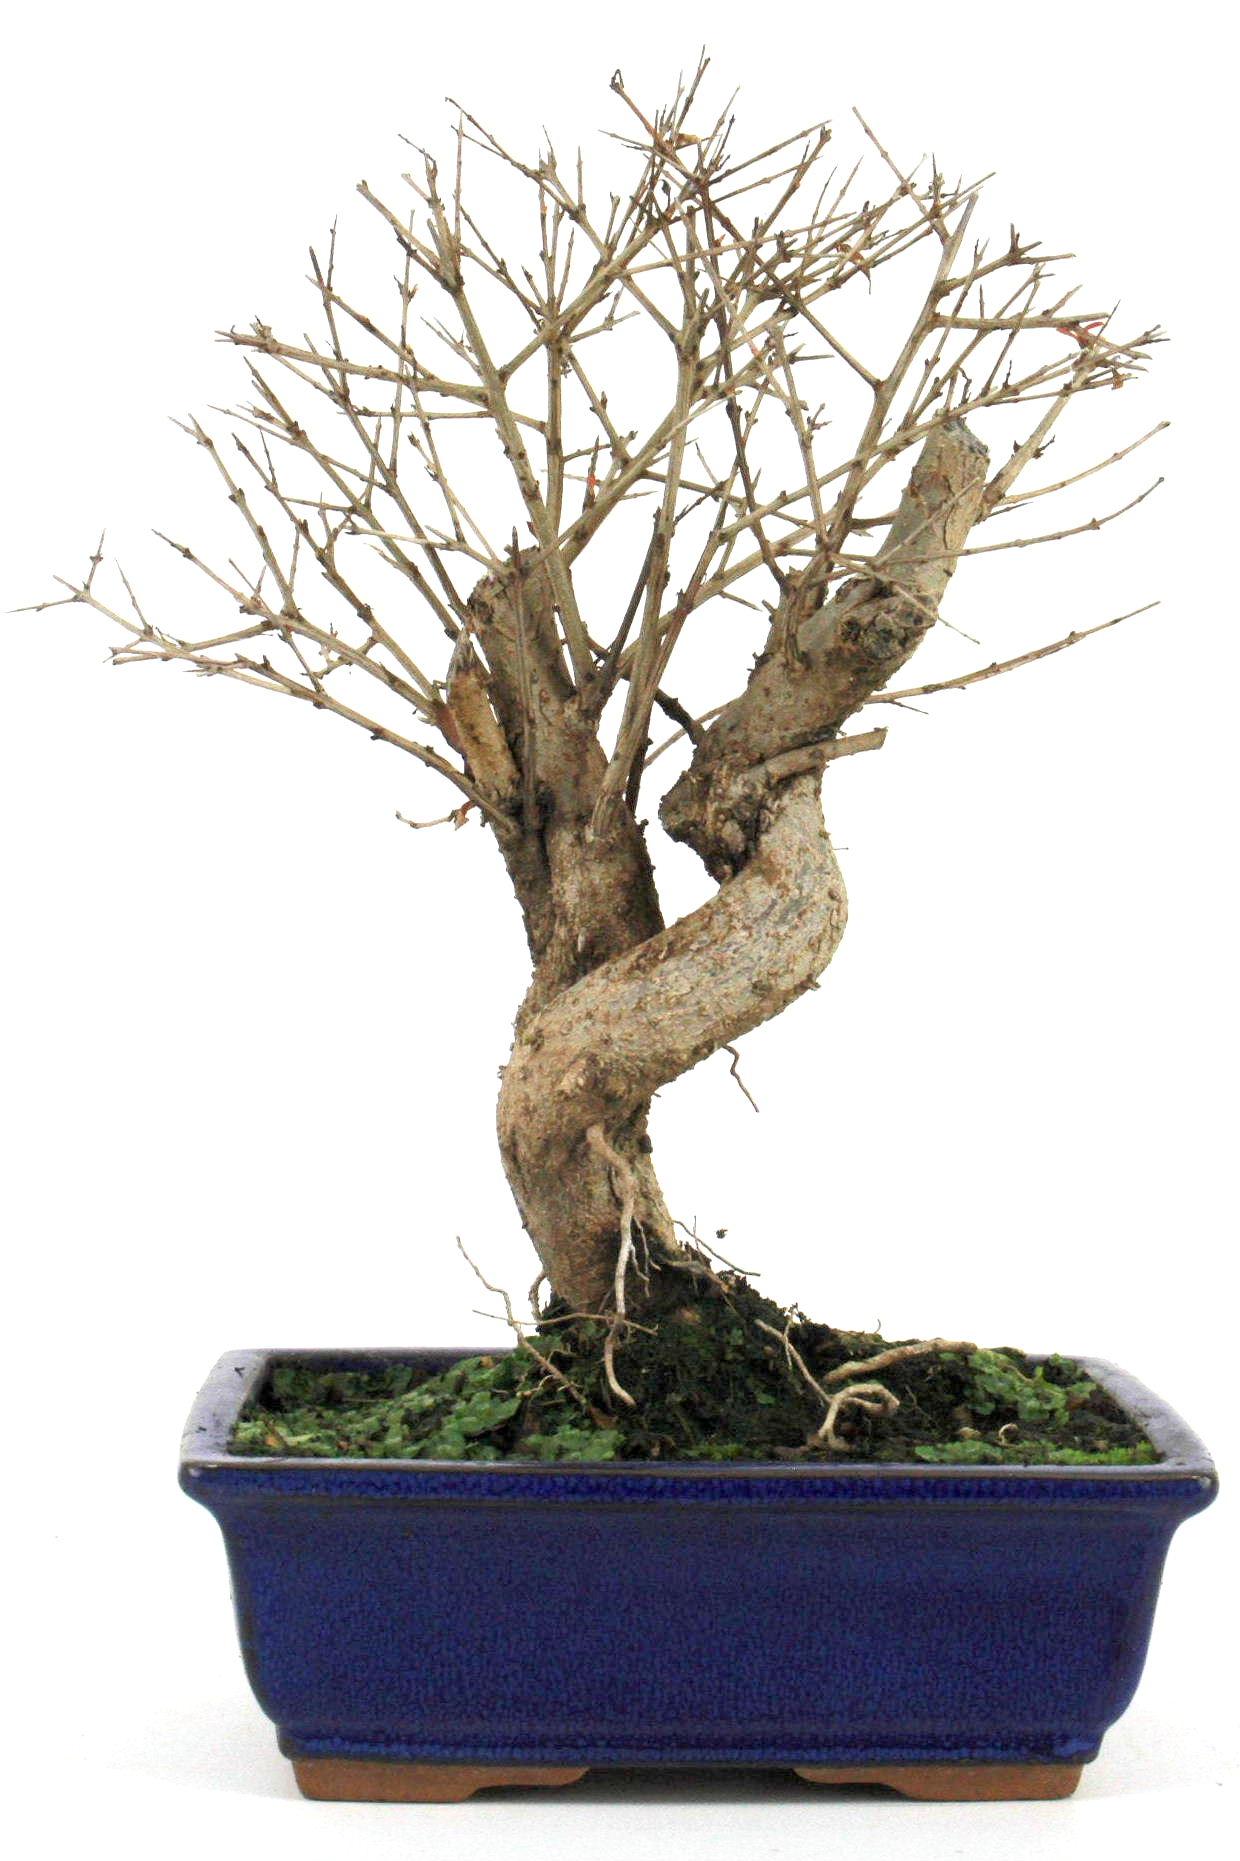 bonsai granatapfel 35 40 cm 1922 bei oyaki bonsai kaufen. Black Bedroom Furniture Sets. Home Design Ideas